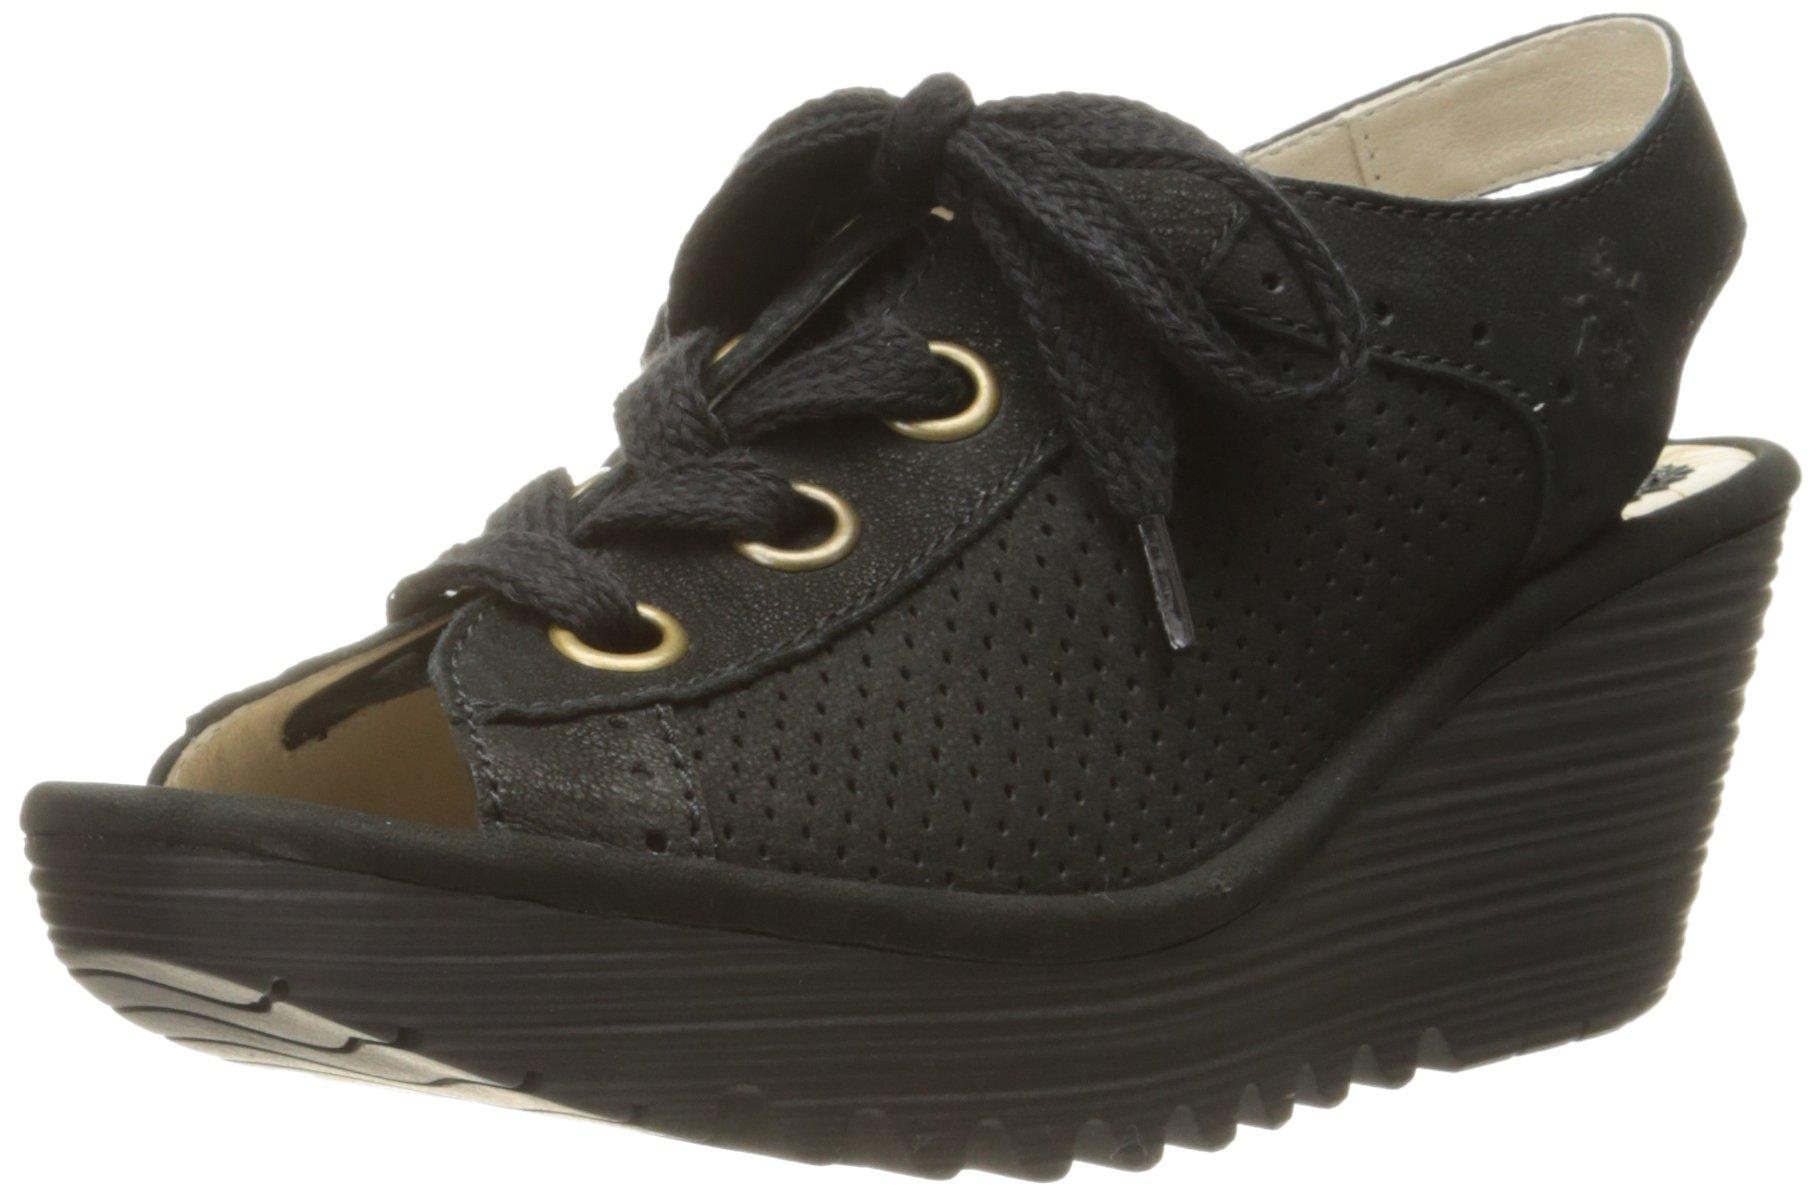 FLY London Women's YUTA617FLY Platform Sandal, black Cupido, 38 EU/7.5-8 M US